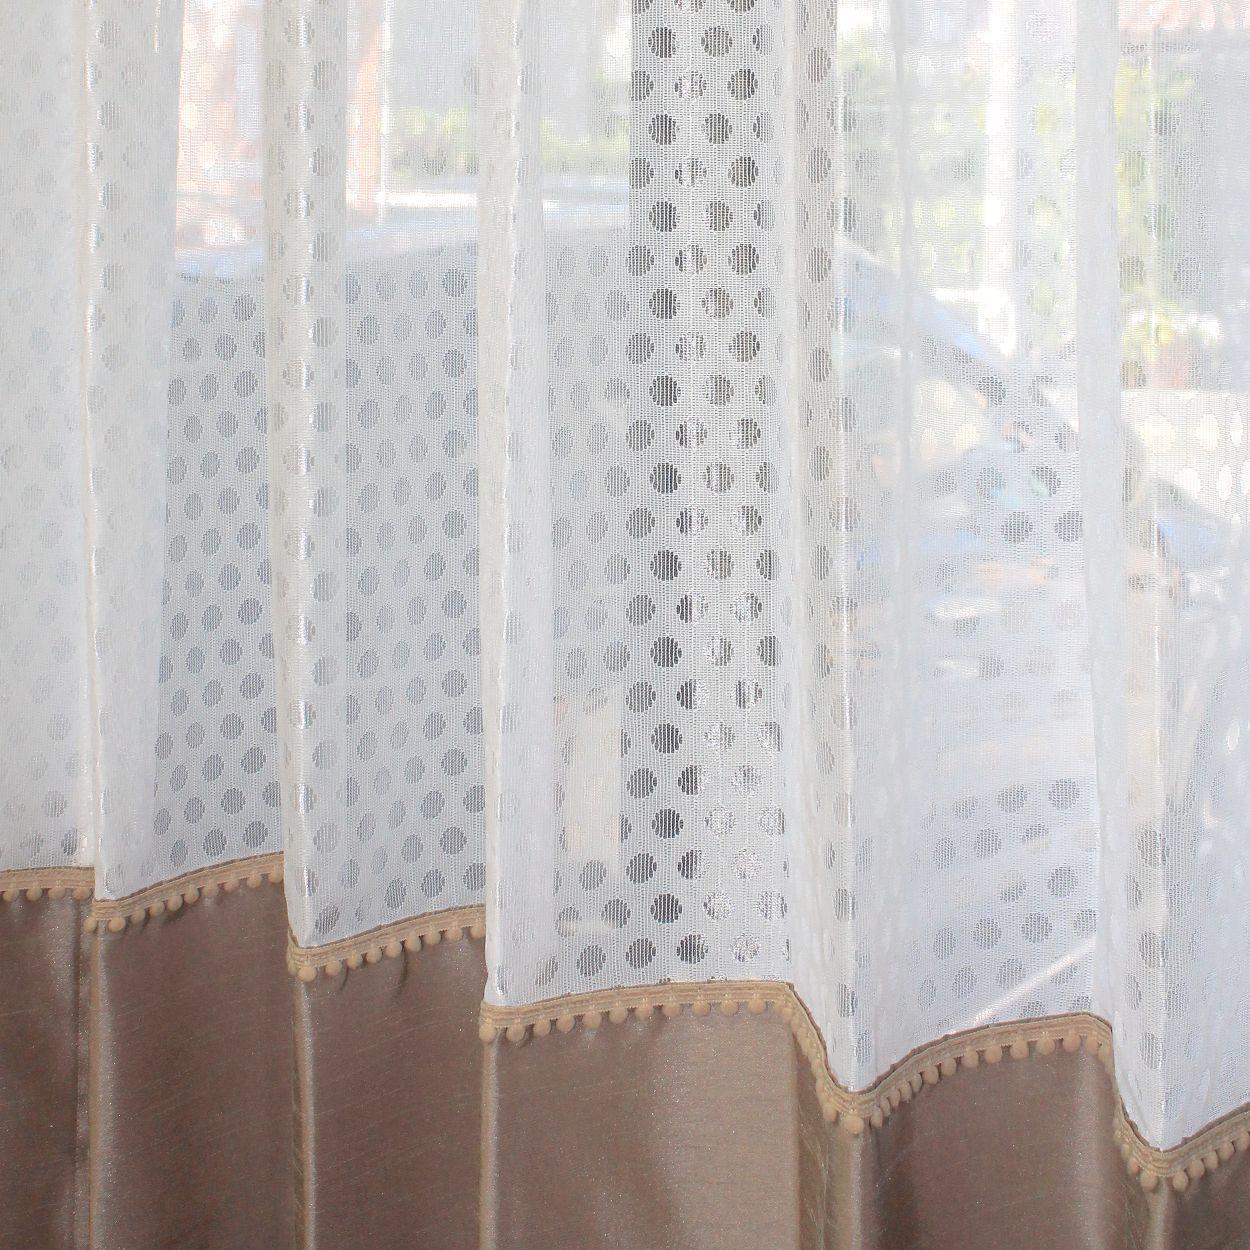 Feng Shui Curtain レースとシャンタンドレープのアンサンブル カーテン カーテン 丈 カーテン生地